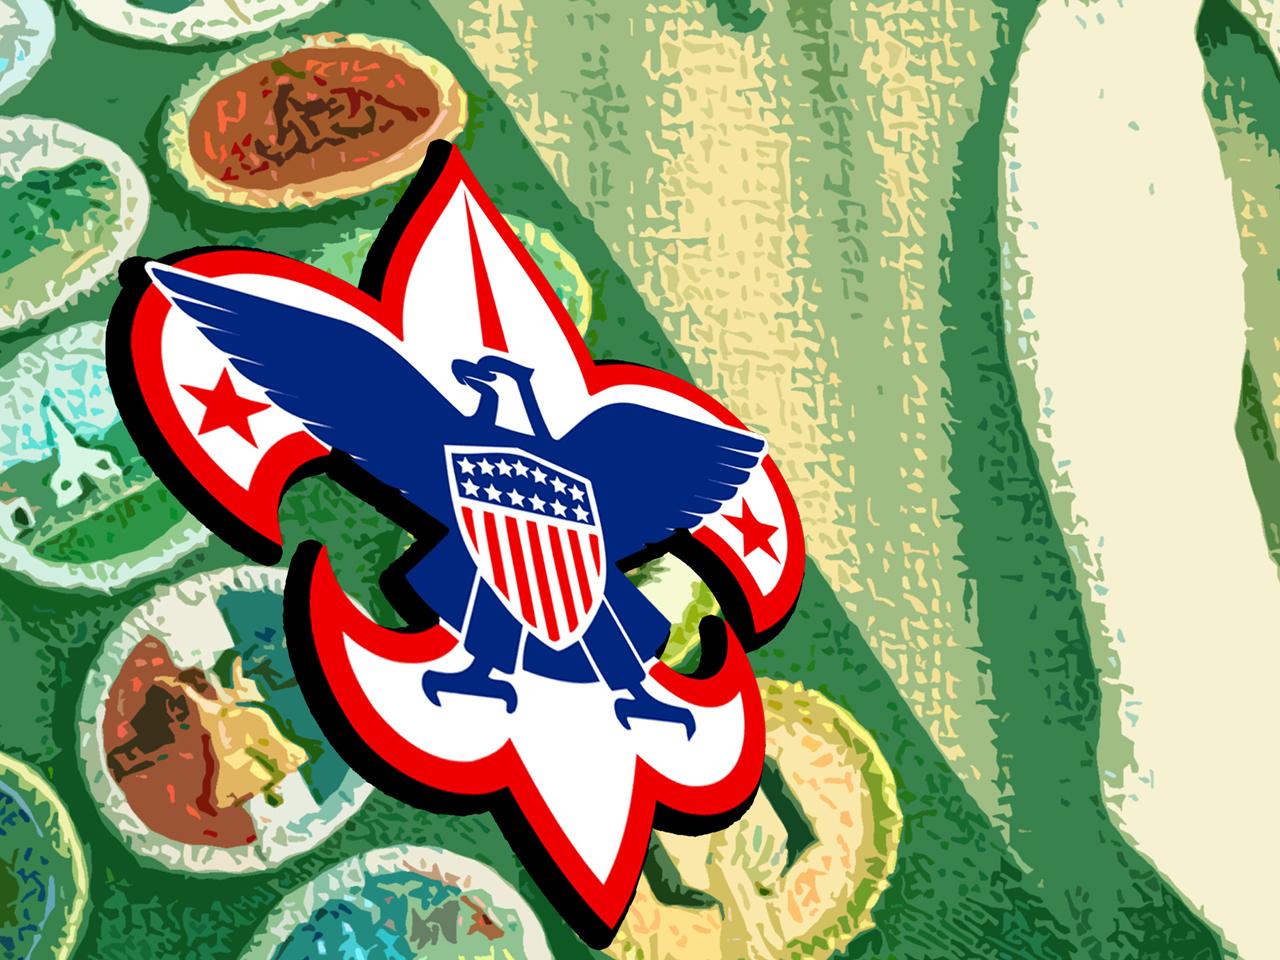 Report dredges up Boy Scouts sex abuse scandal